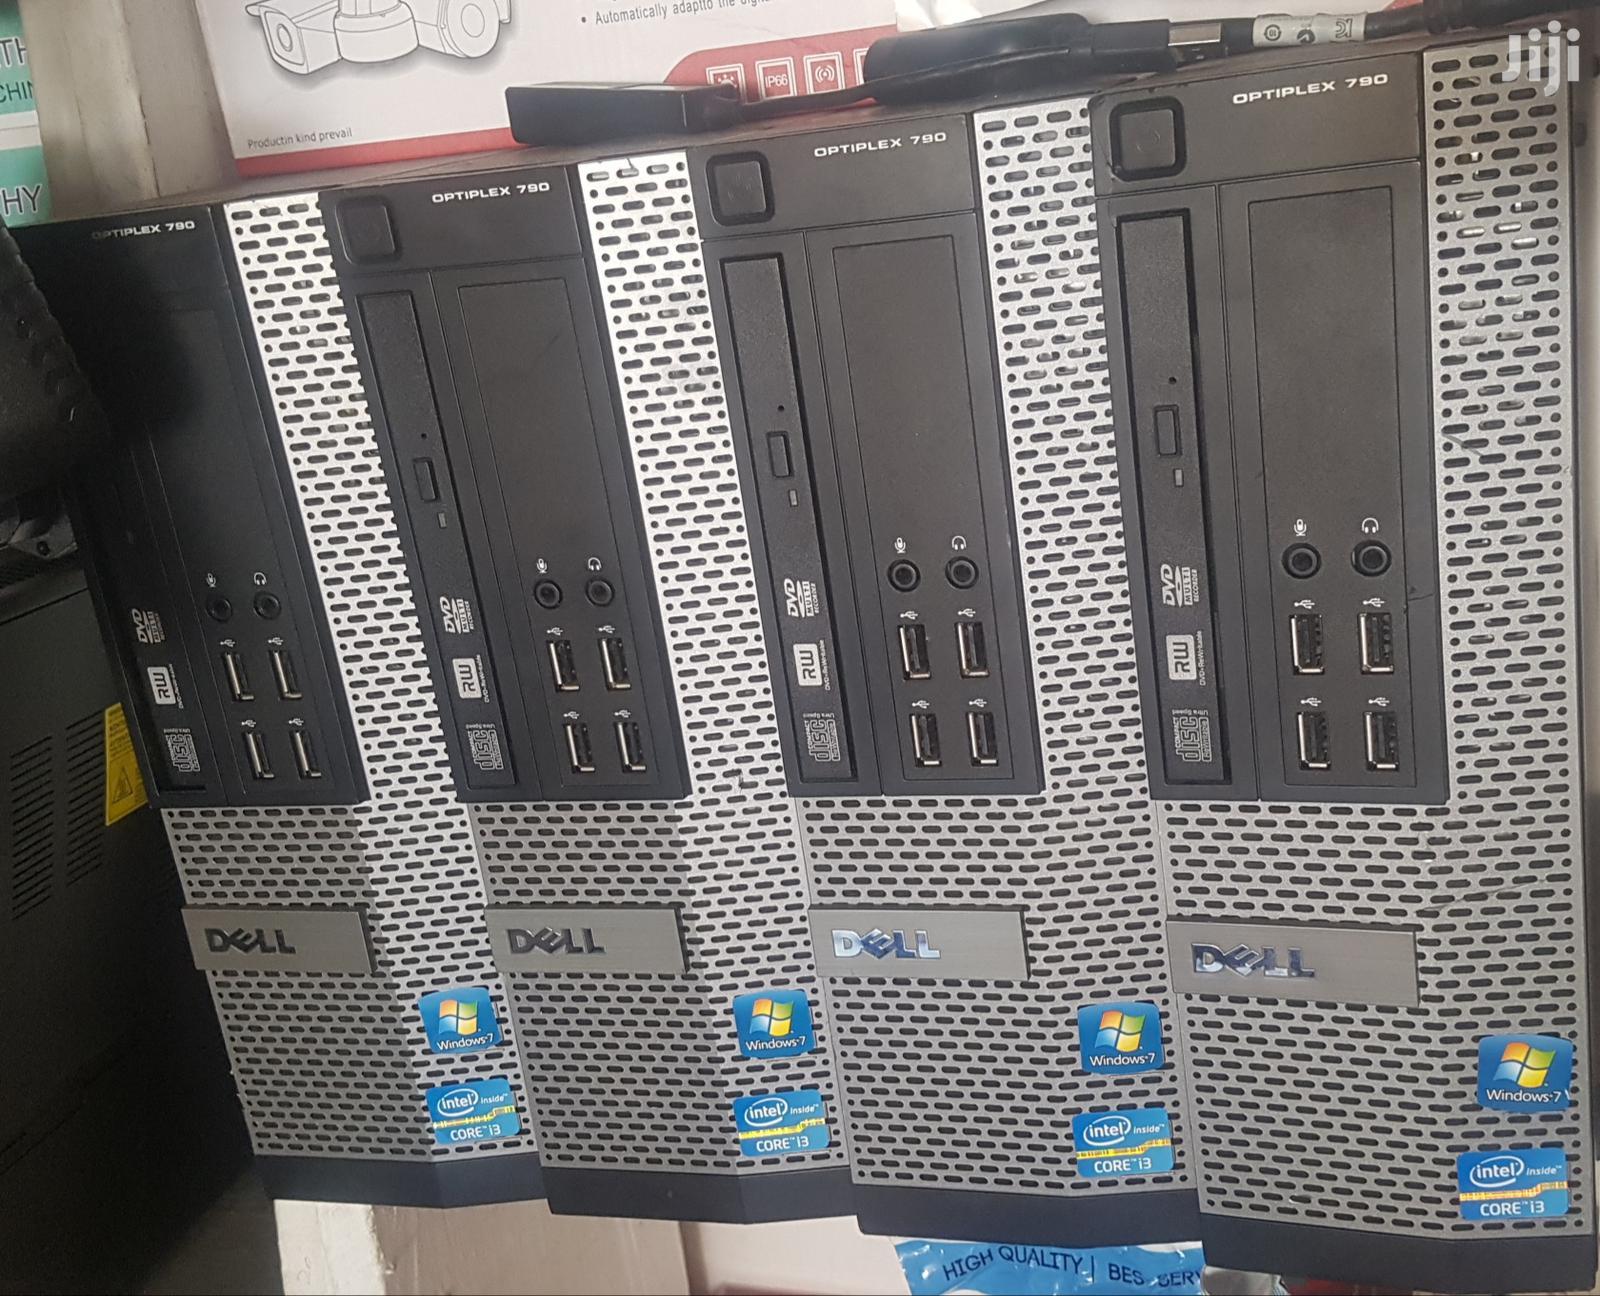 Desktop Computer Dell 4GB Intel Core i3 500GB | Laptops & Computers for sale in Accra Metropolitan, Greater Accra, Ghana